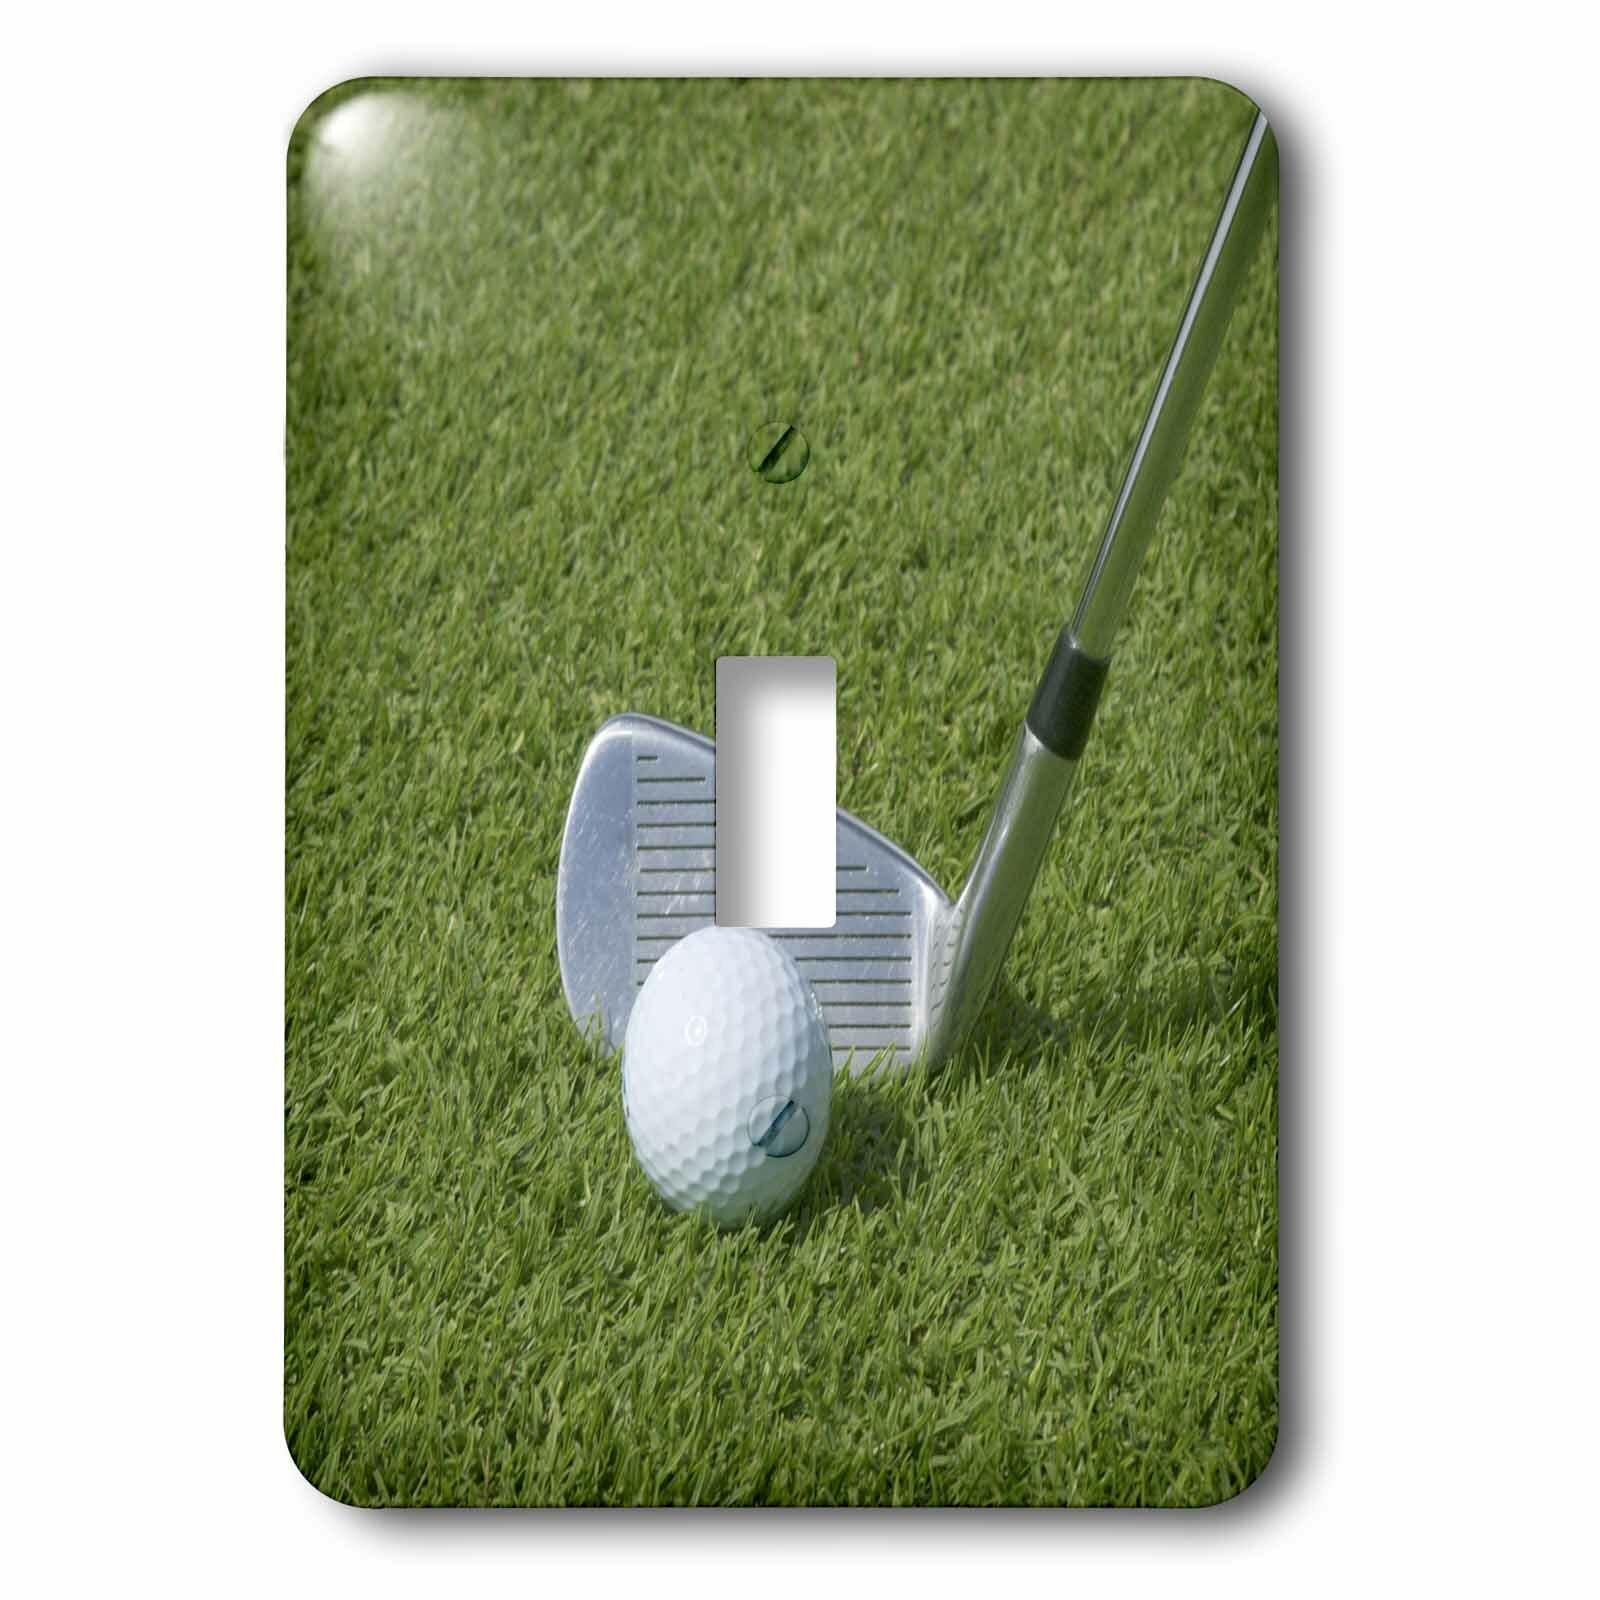 3drose Dominican Republic Bavaro Punta Blanca Golf Club 1 Gang Toggle Light Switch Wall Plate Wayfair